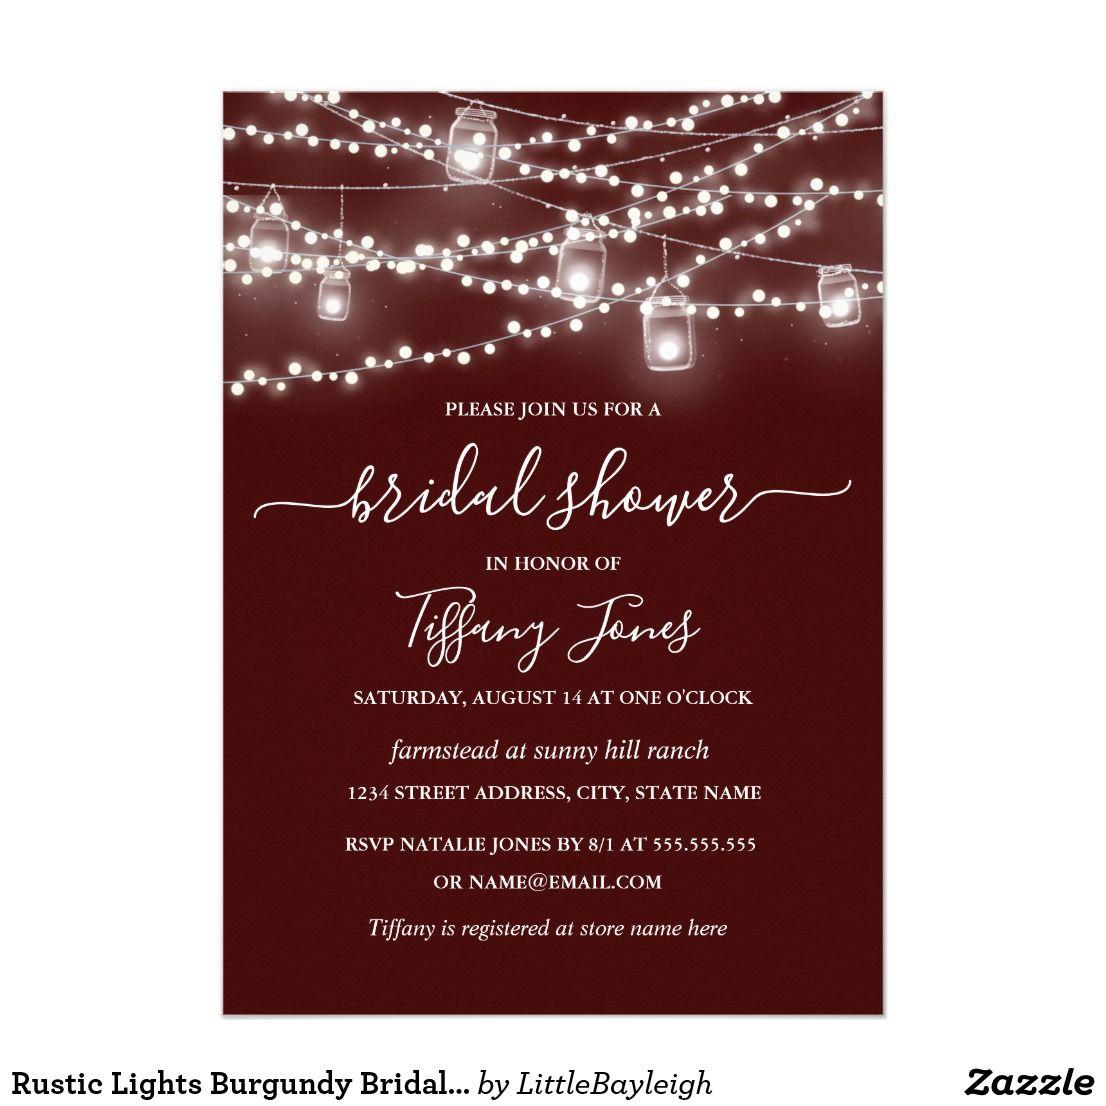 Rustic Lights Burgundy Bridal Shower Invitation | Bridal showers and ...